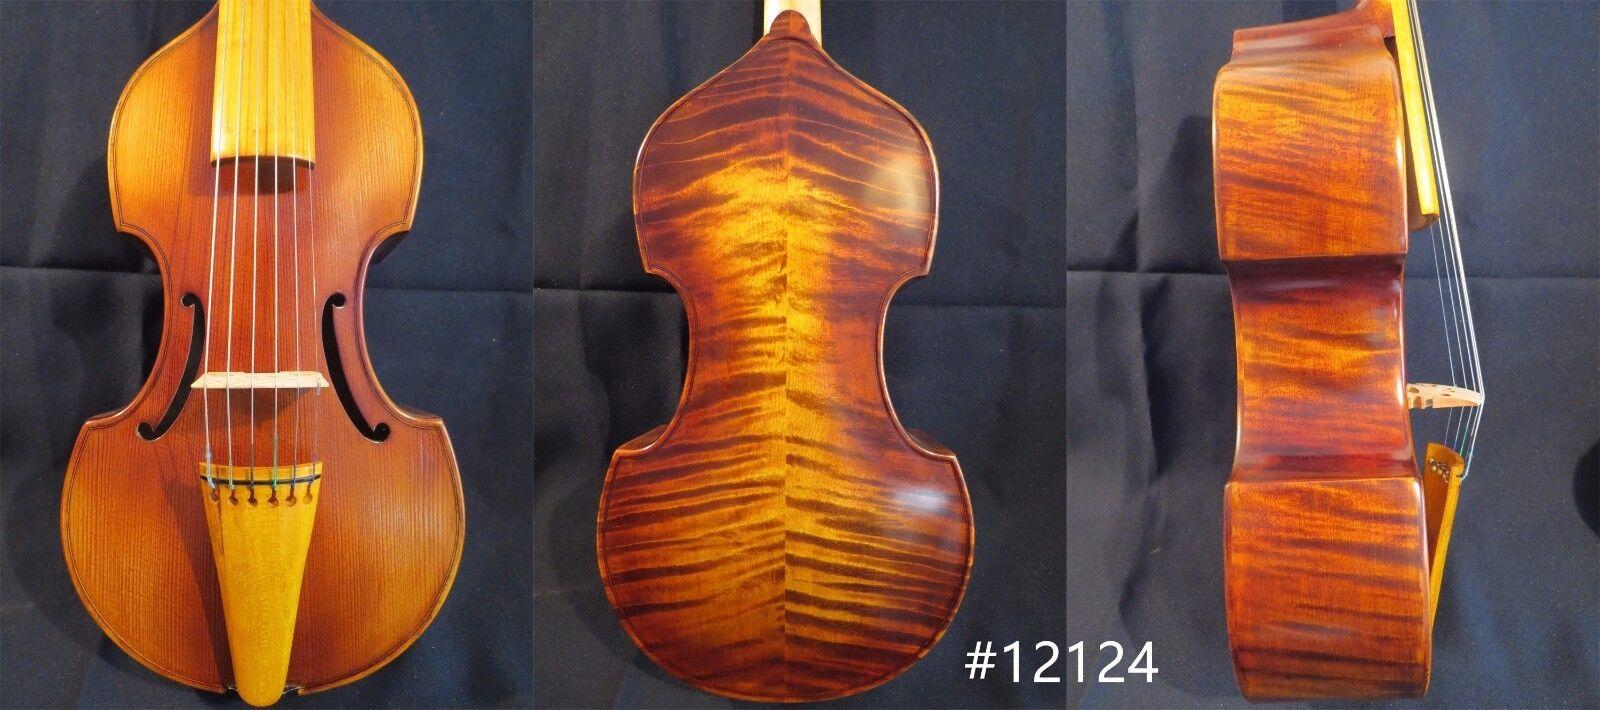 Canción de estilo barroco barroco barroco Marca Marca maestro 6 Cuerdas 13 3 4  púrpura da gamba  12124 b5928e